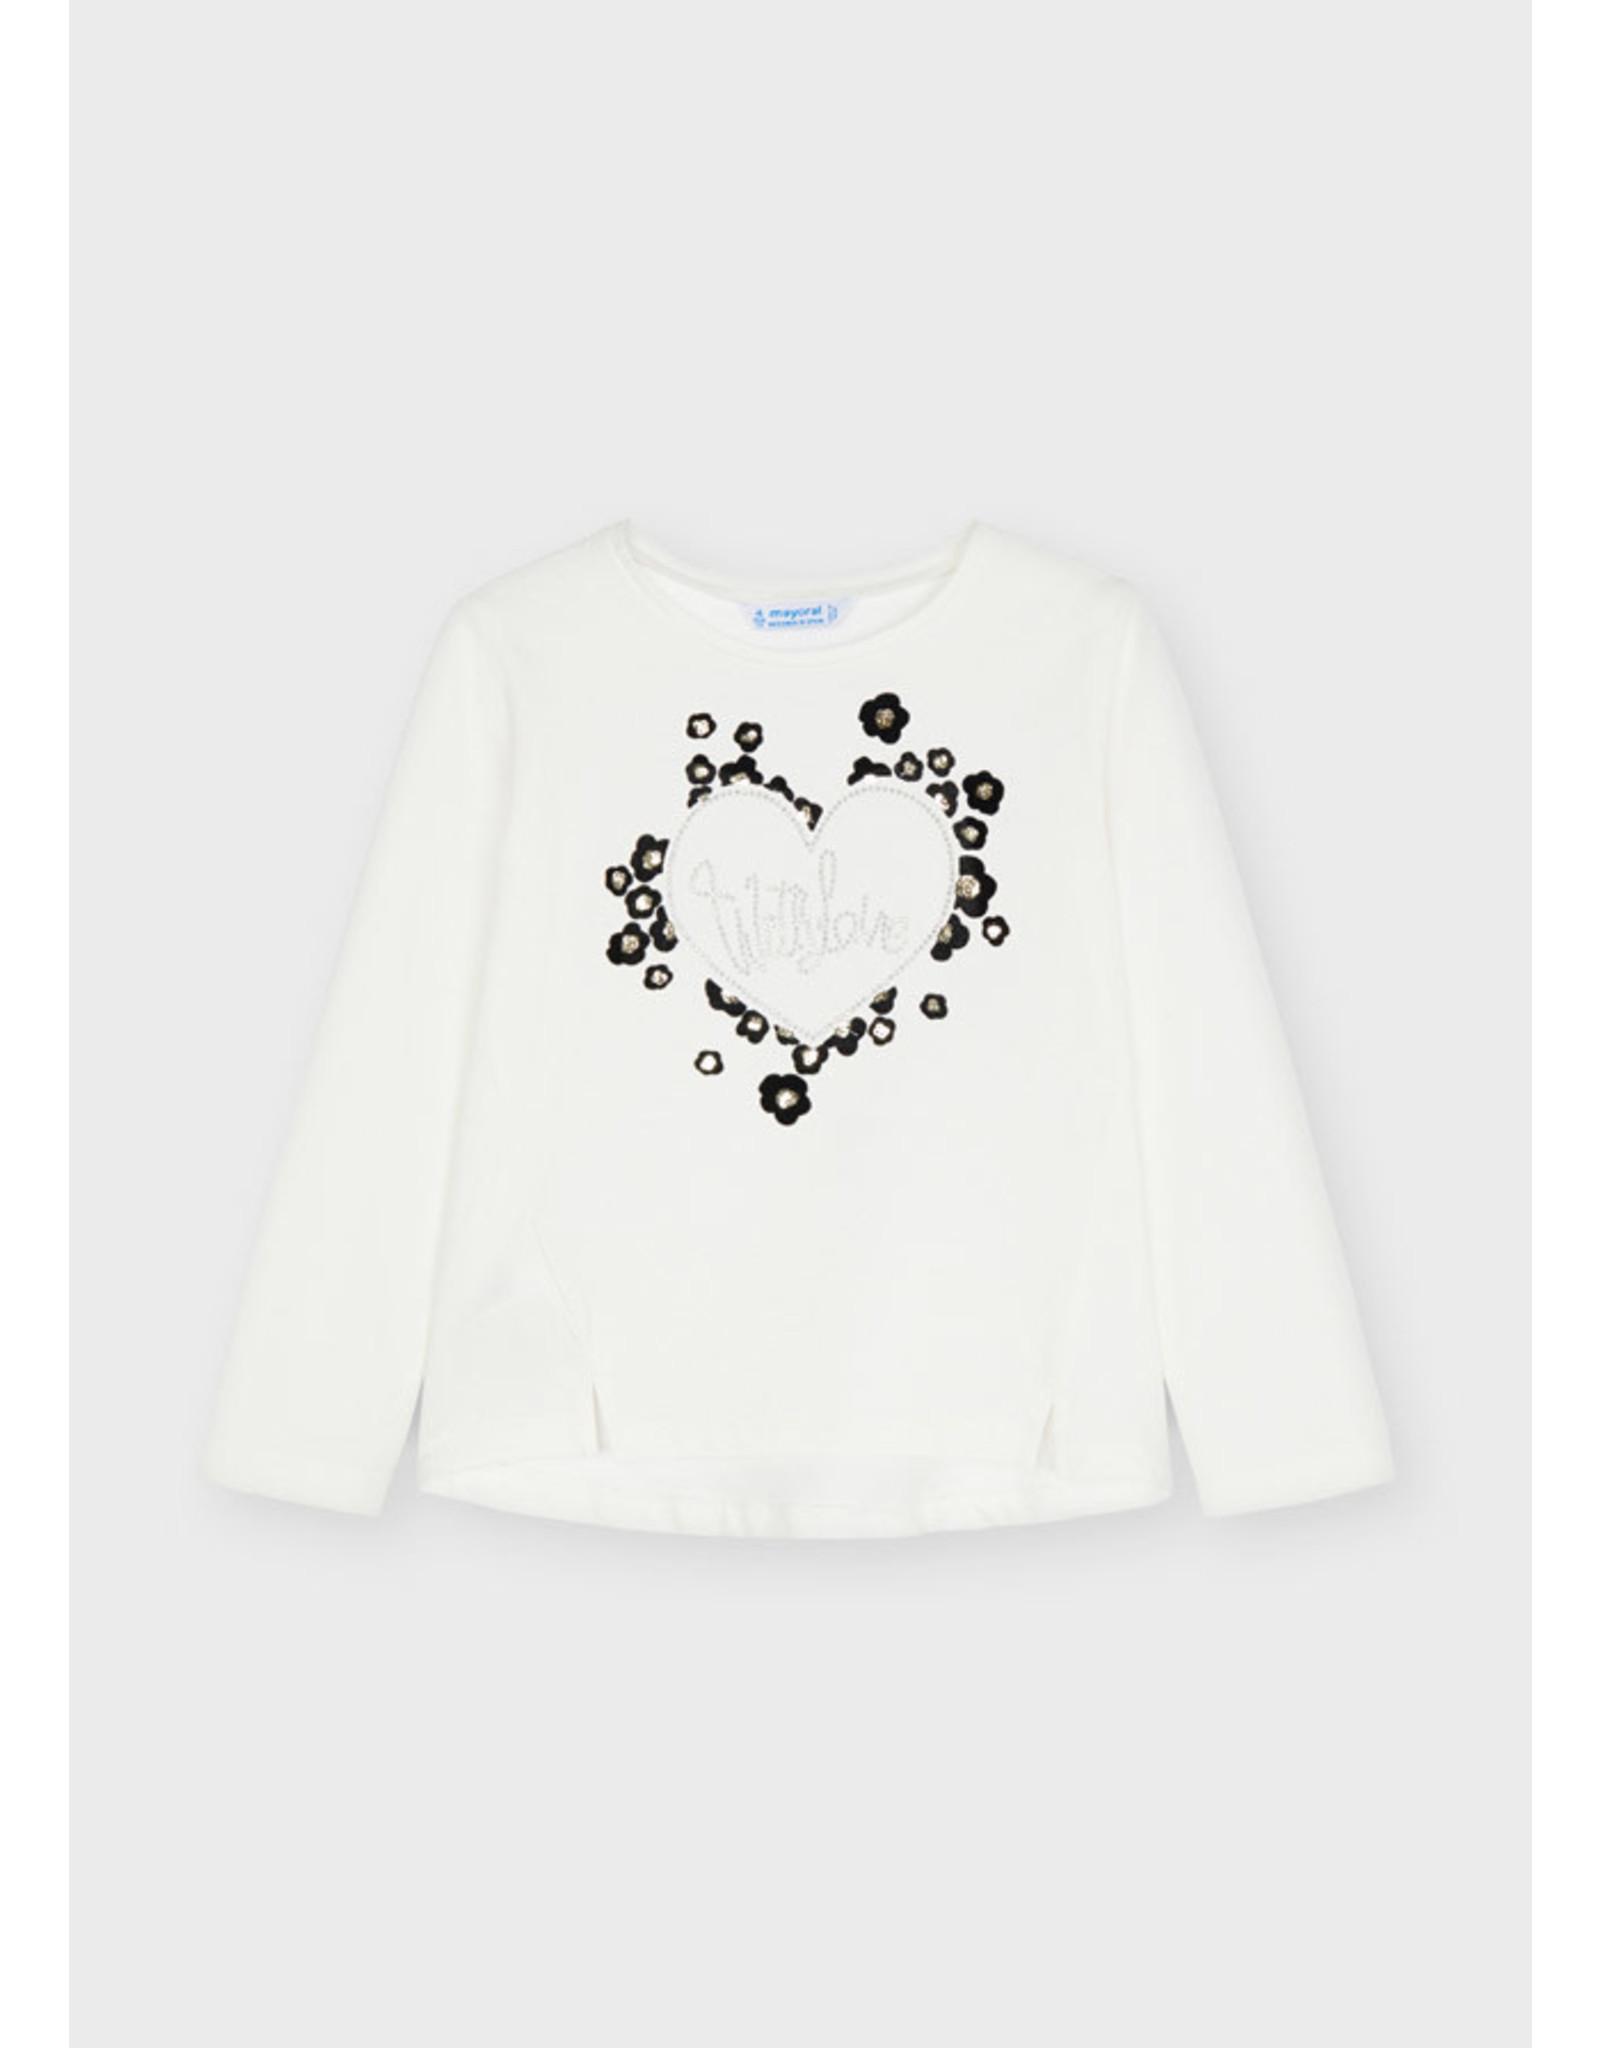 Mayoral Hearts Flock T-Shirt